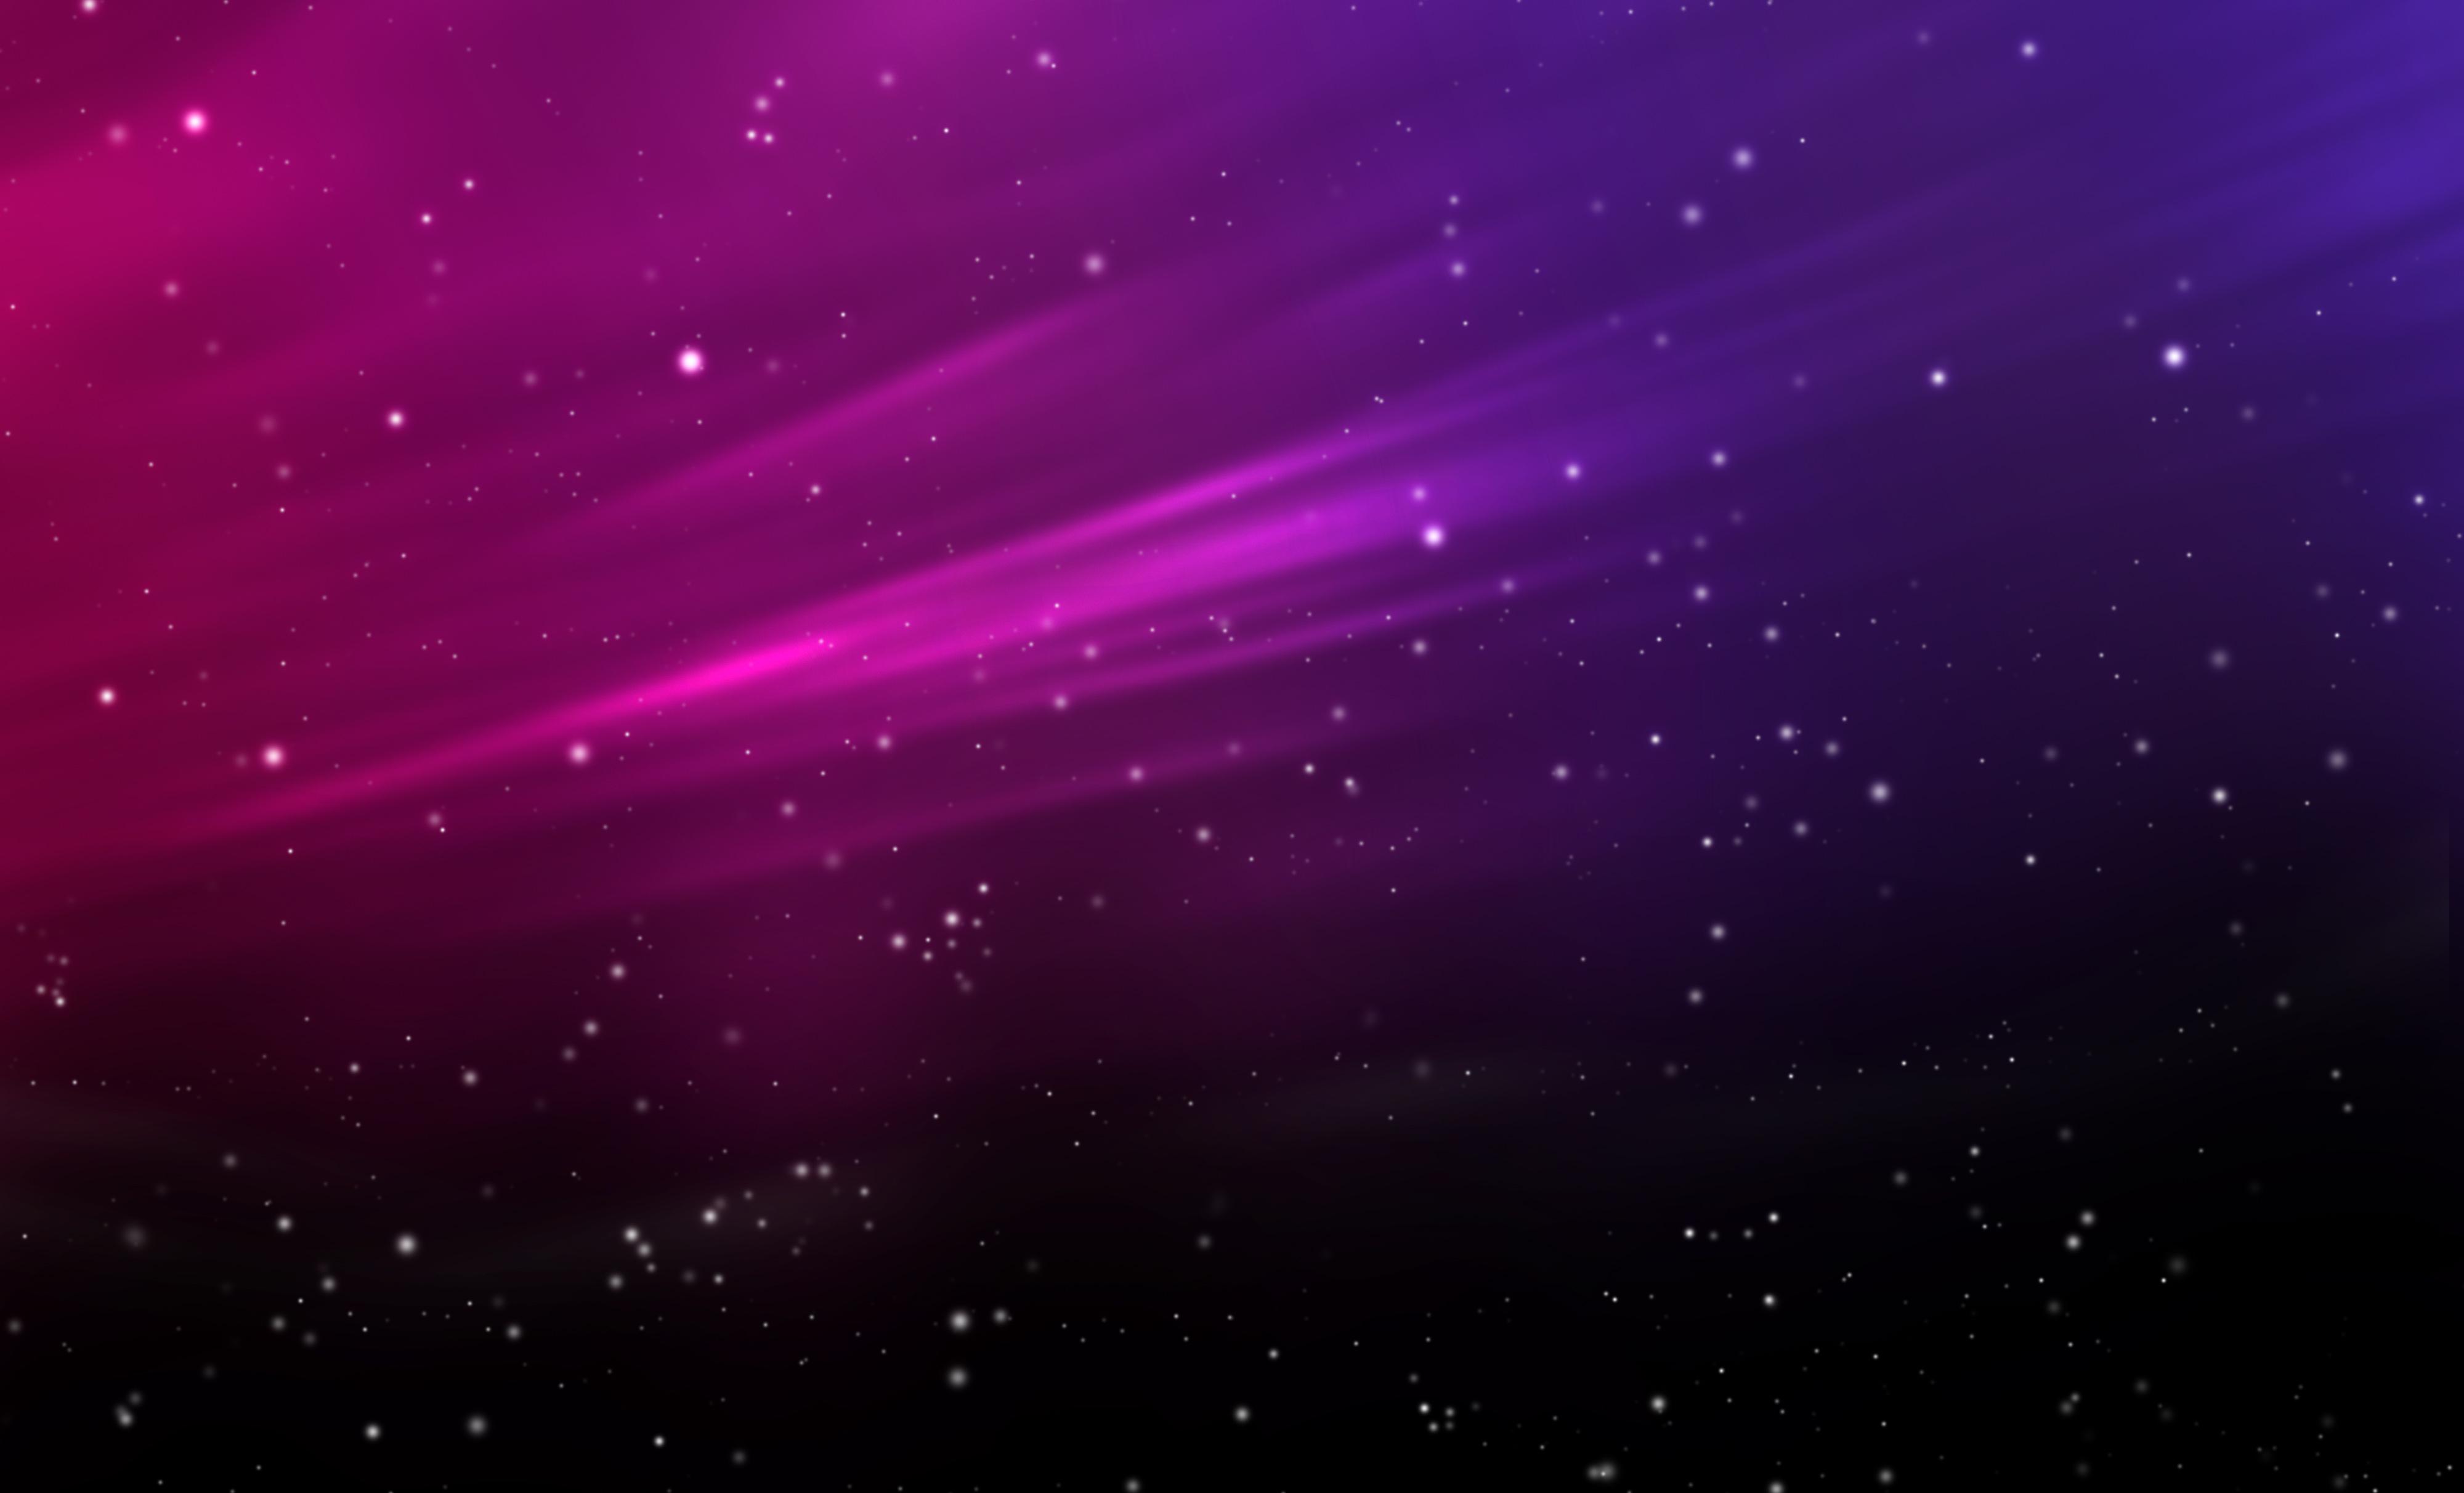 Galaxy background purple and pink pattern pink purple - Pink and purple wallpaper ...